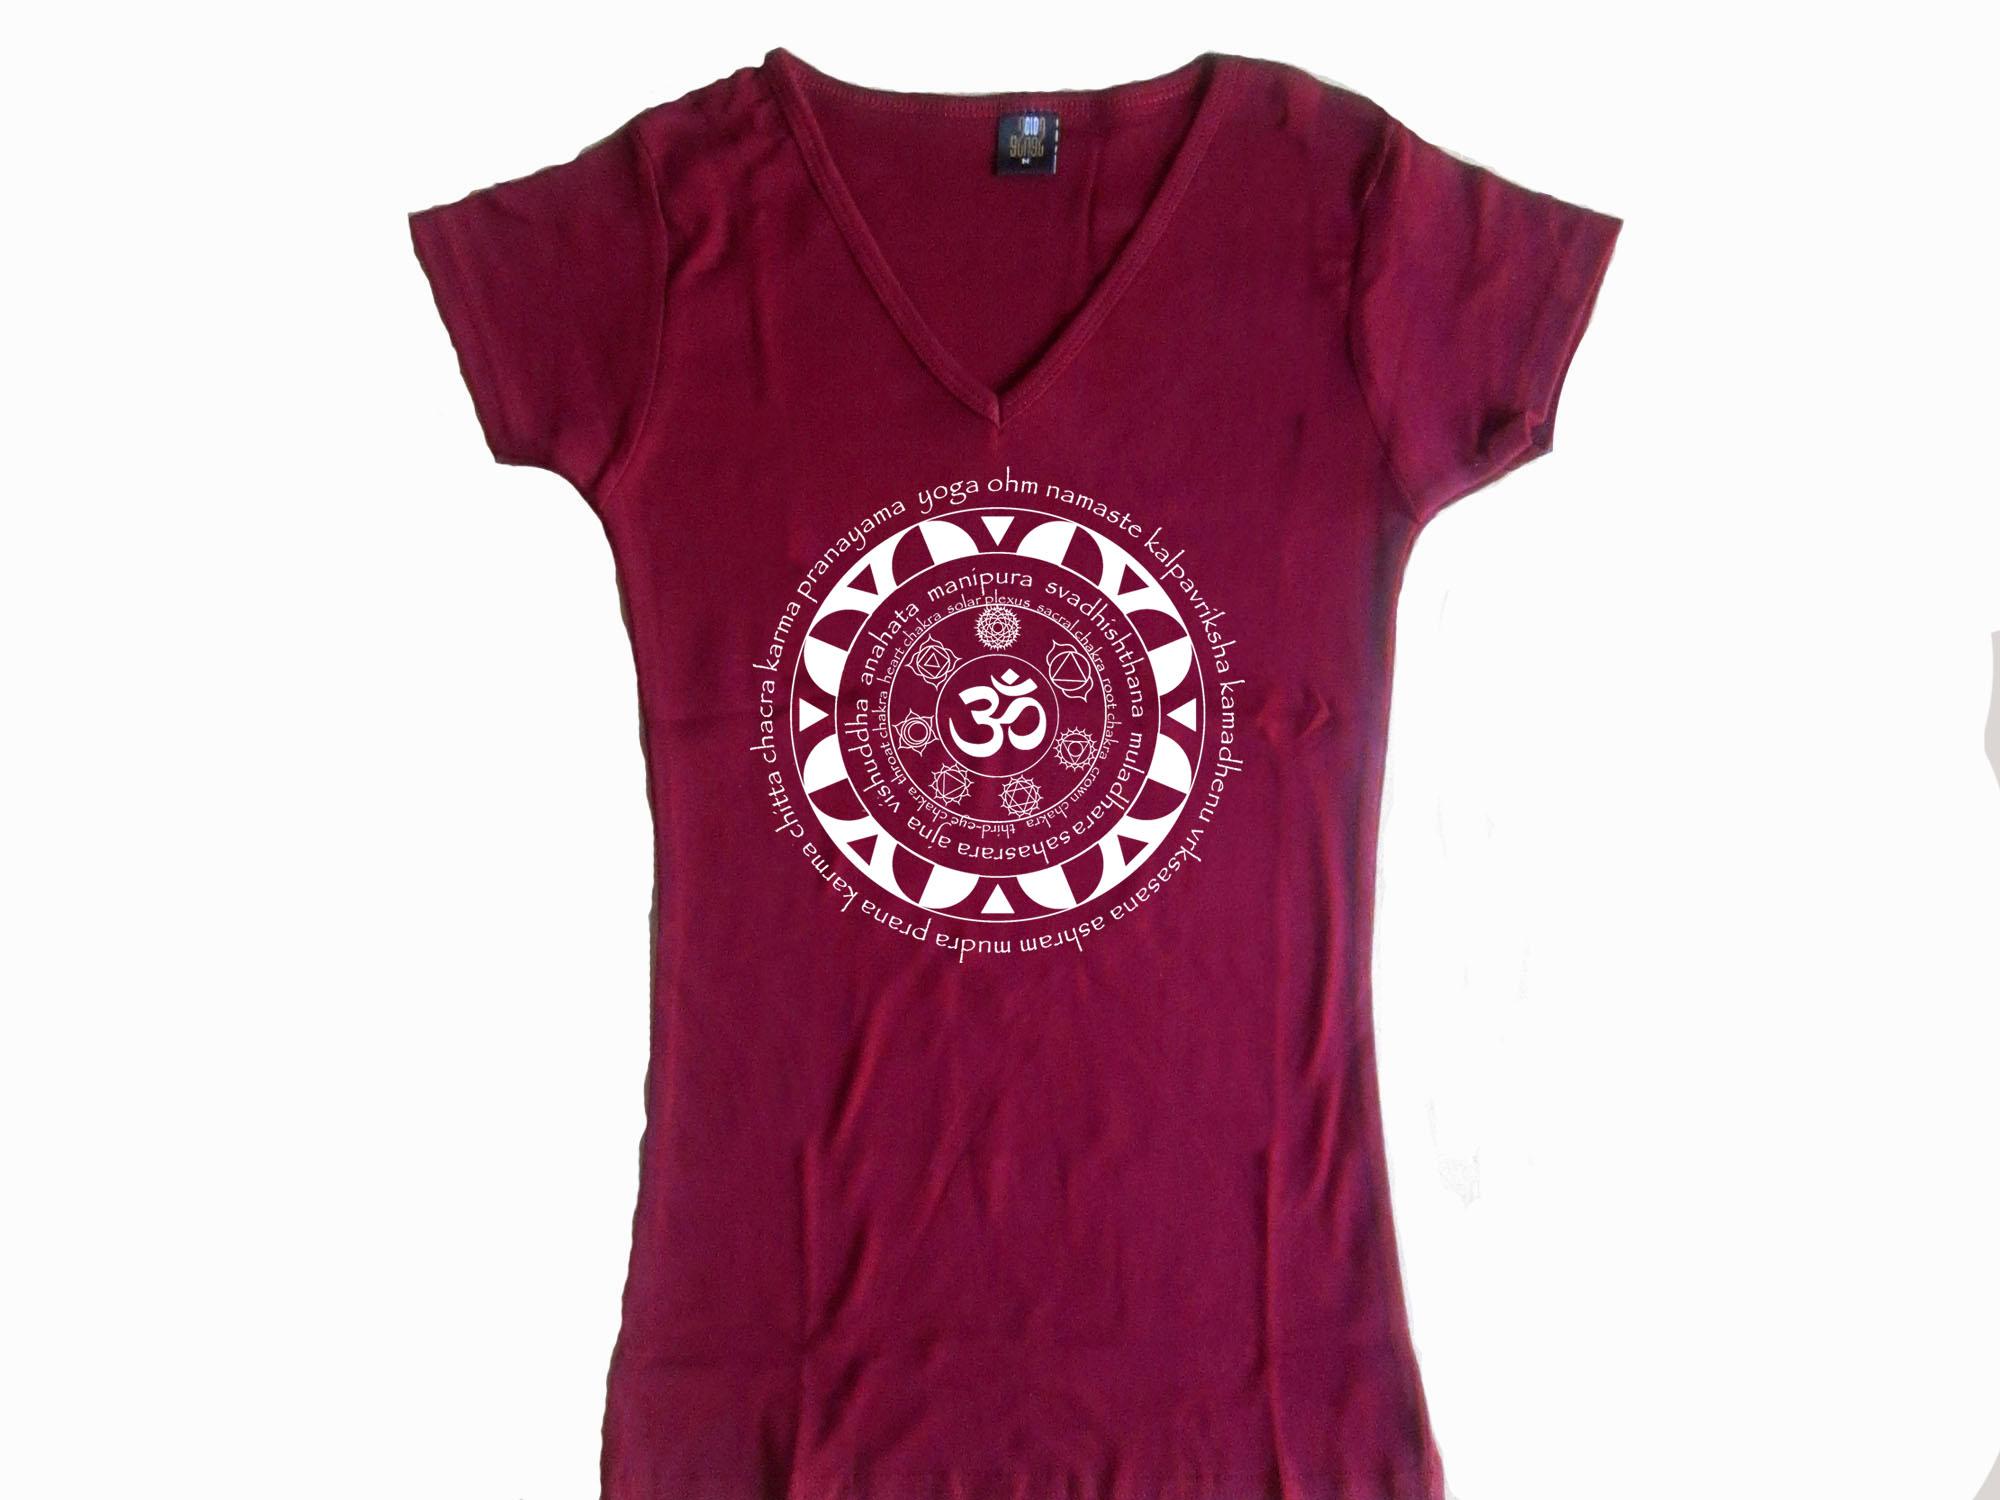 Oga female t shirts my cool t shirt mandala 7 chakras om w yoga terms women bordeaux t shirt izmirmasajfo Images